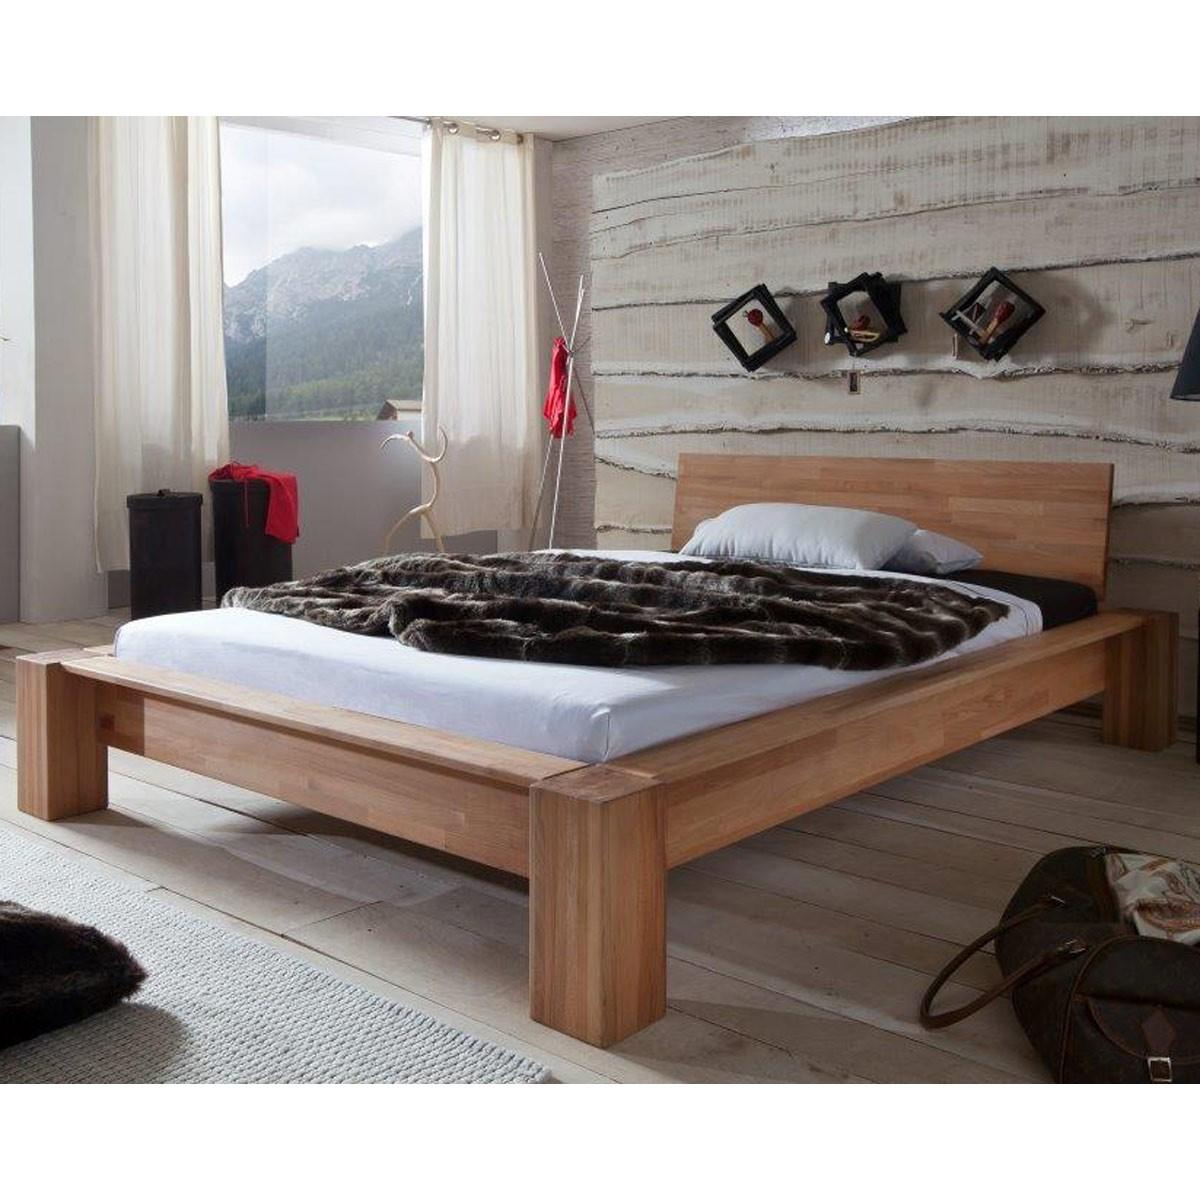 bett luzia 180 x 200 cm in kernbuche massiv ge lt. Black Bedroom Furniture Sets. Home Design Ideas